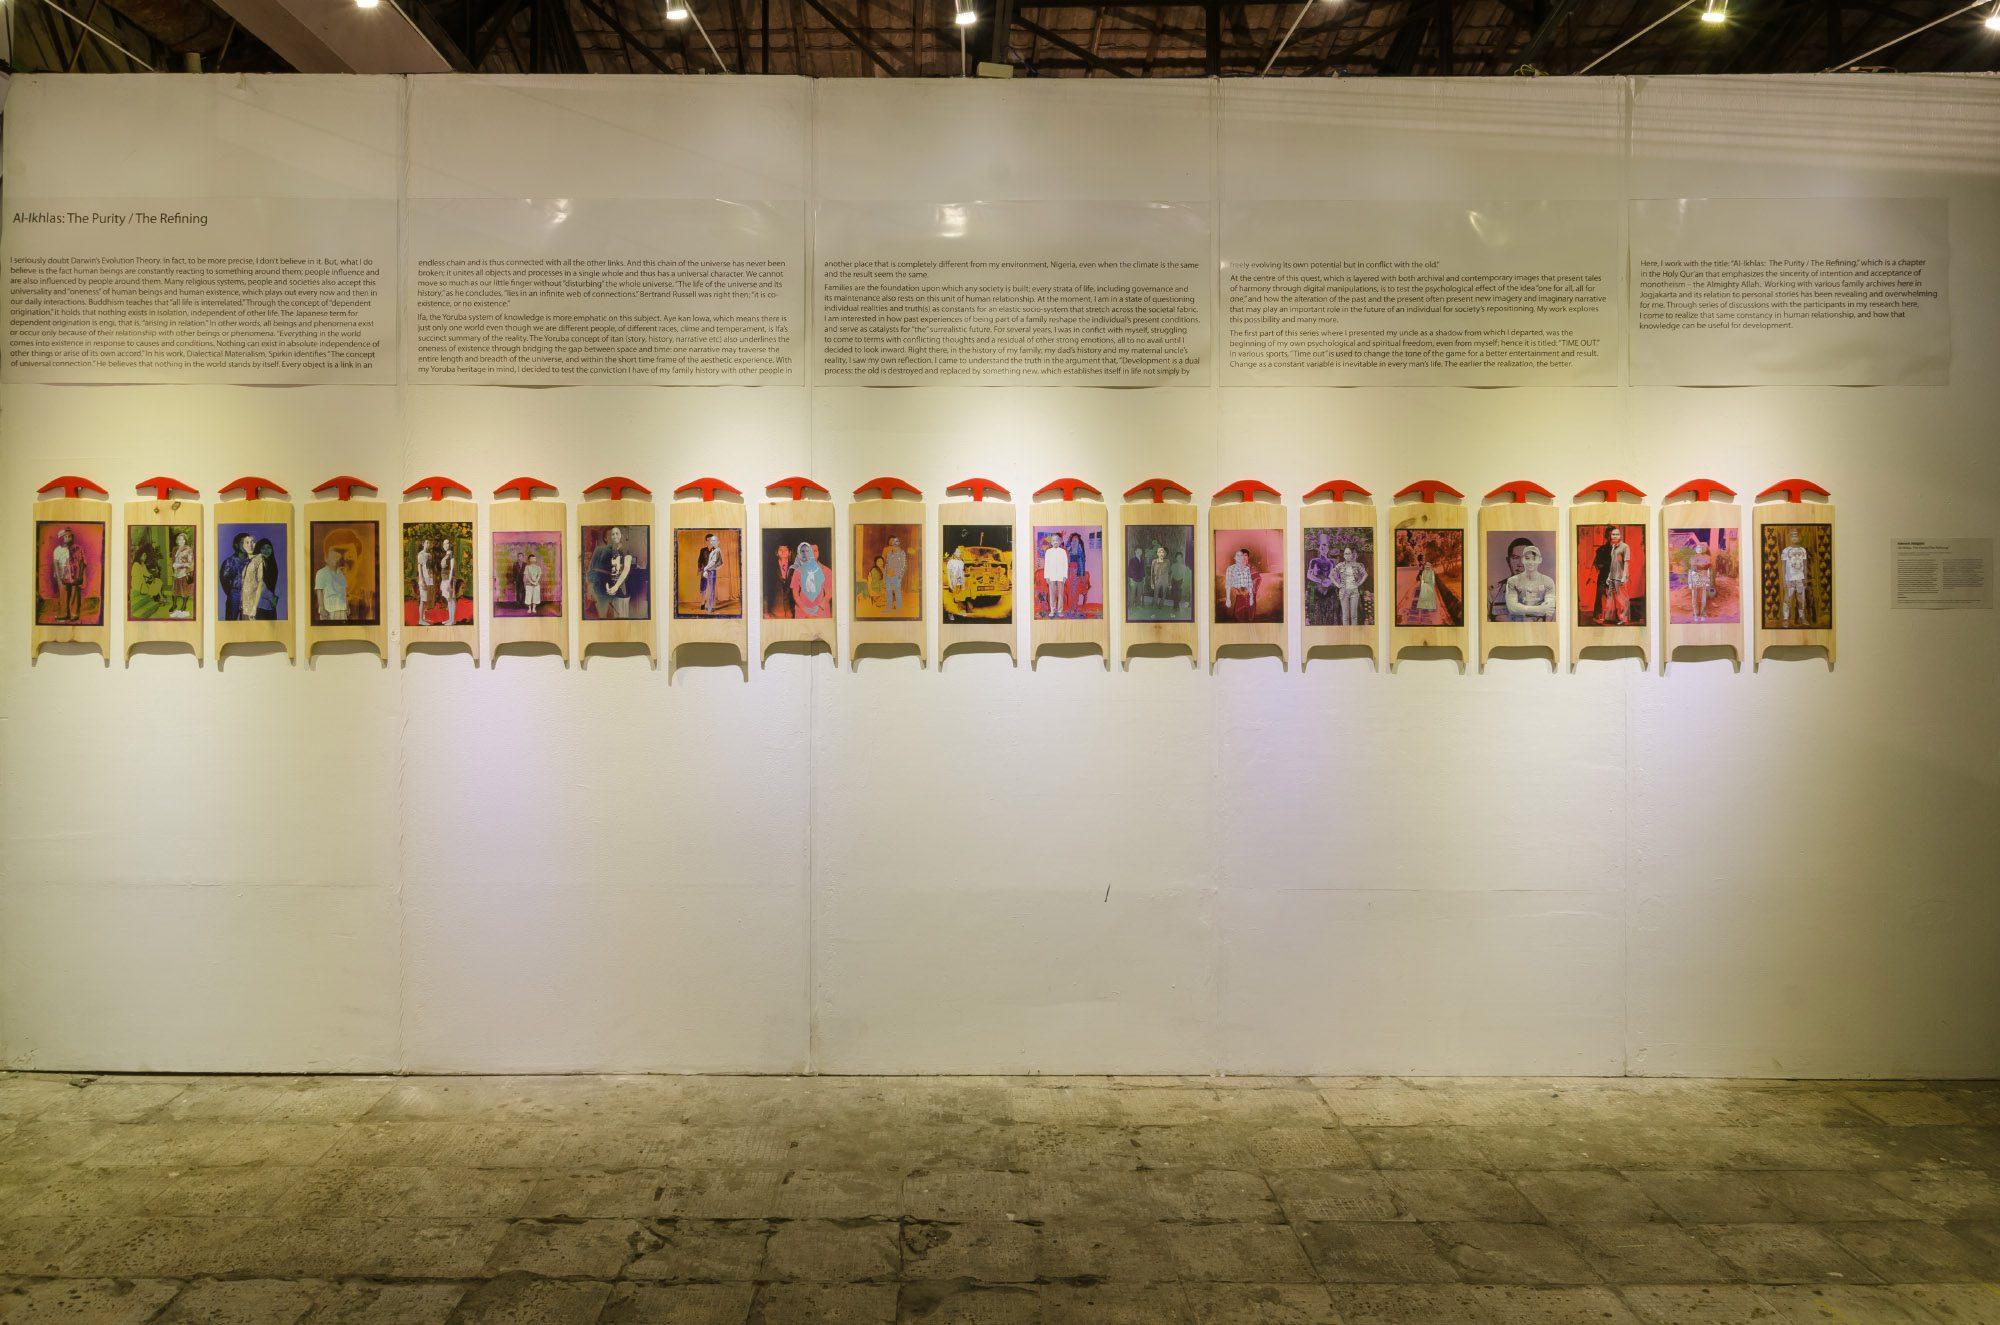 Aderemi Adegbite, 'Al-Ikhlas. The Purity The Reading', Photography on Islamic Slates. Photo Credits Kelas Pagi Yogyakarta and Biennale Jogja XIII